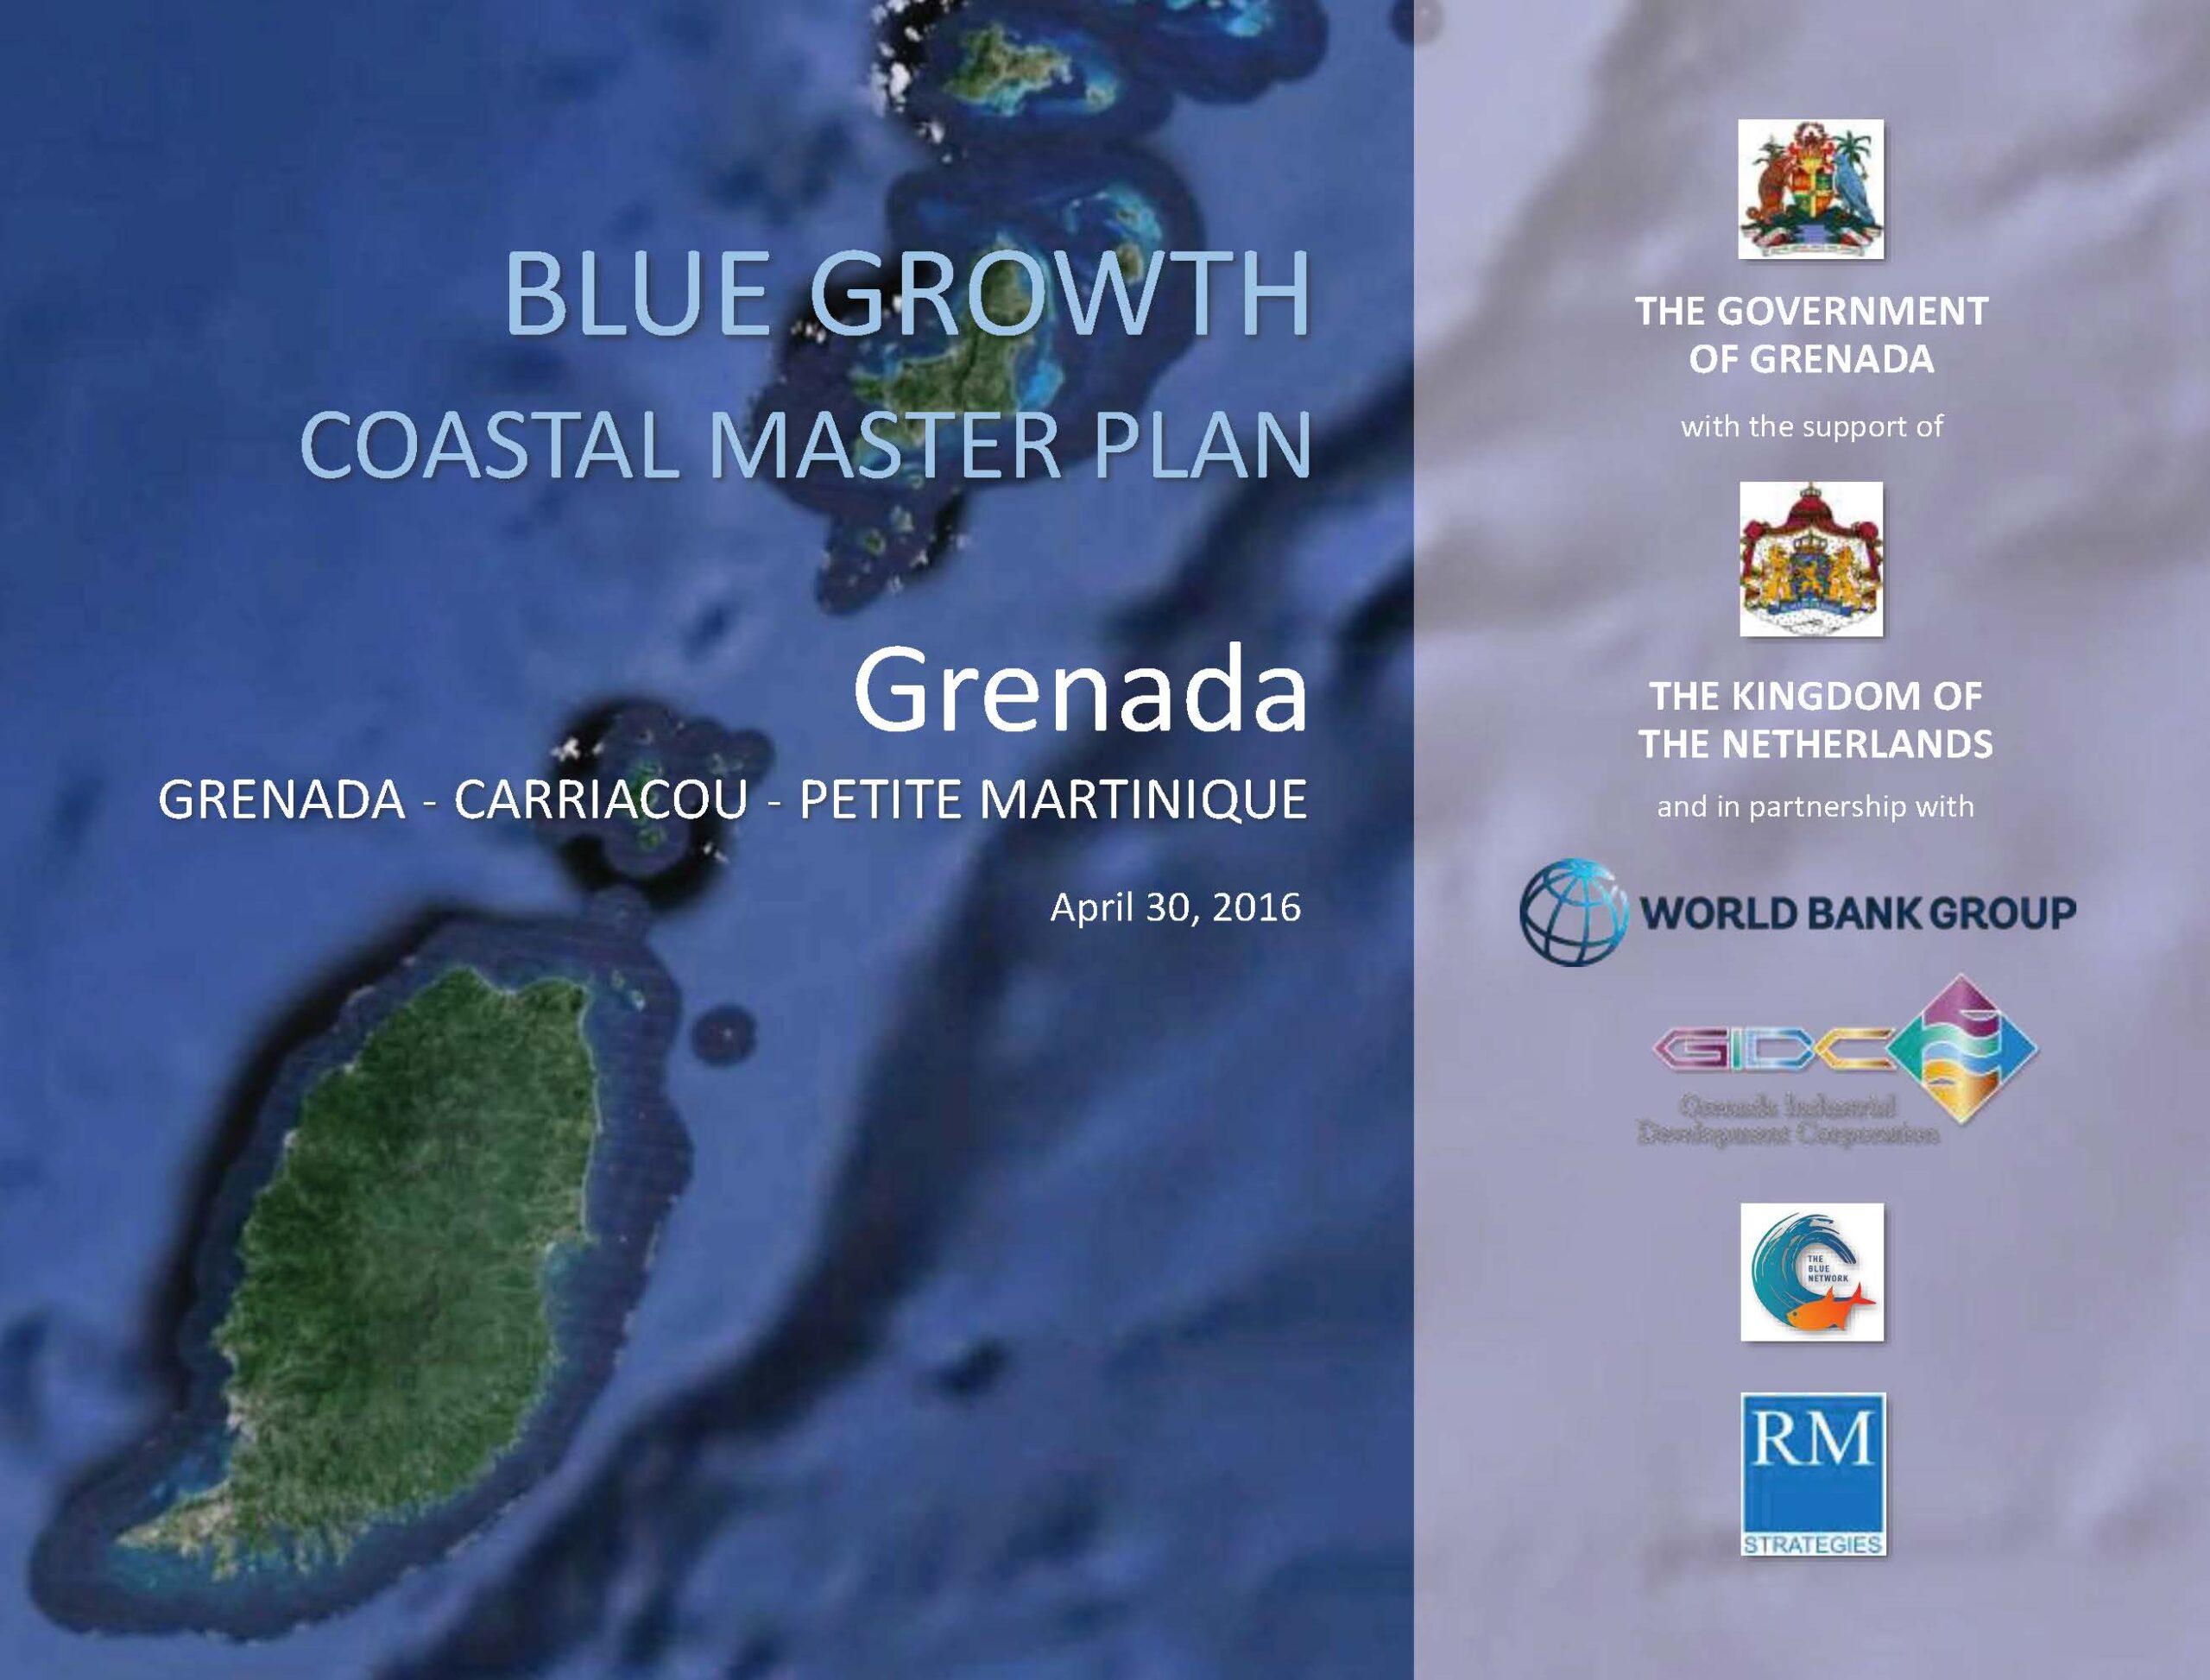 Blue Growth Coastal Master Plan: Grenada